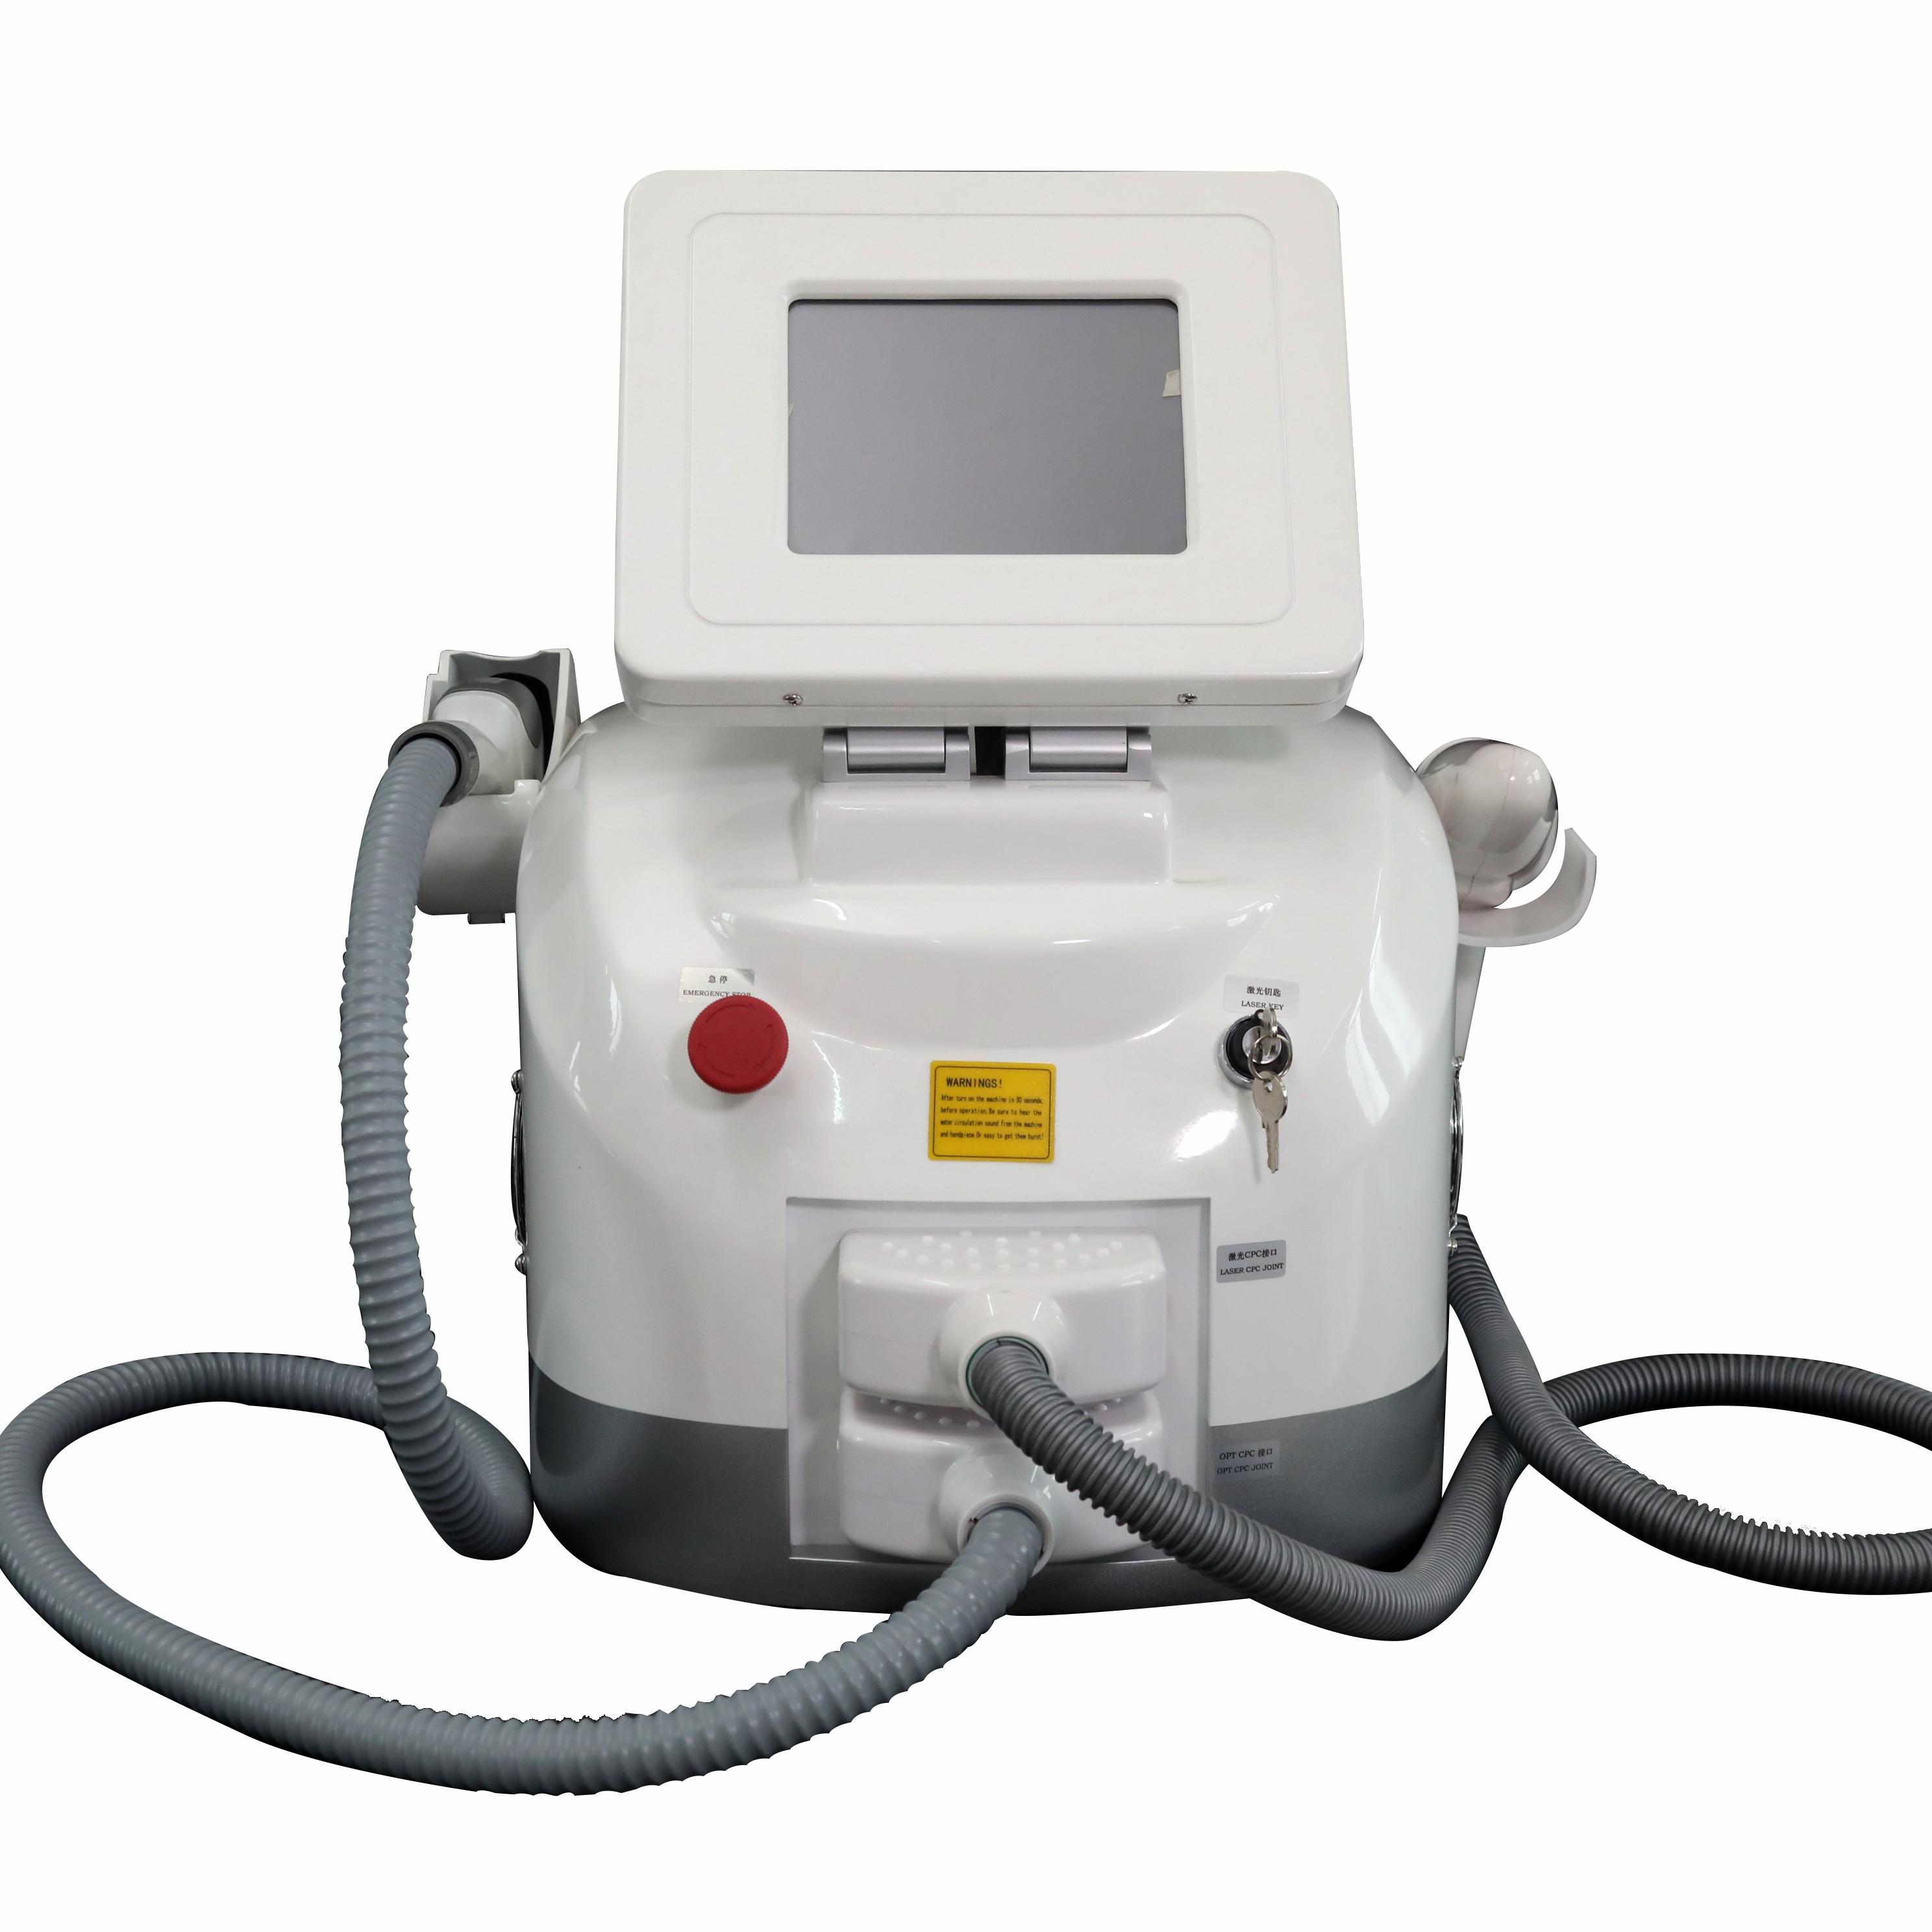 Multifunction IPL shr laser hair removal beauty machine/manipulo ipl shr laser med hair removal machine skin rejuvenation фото